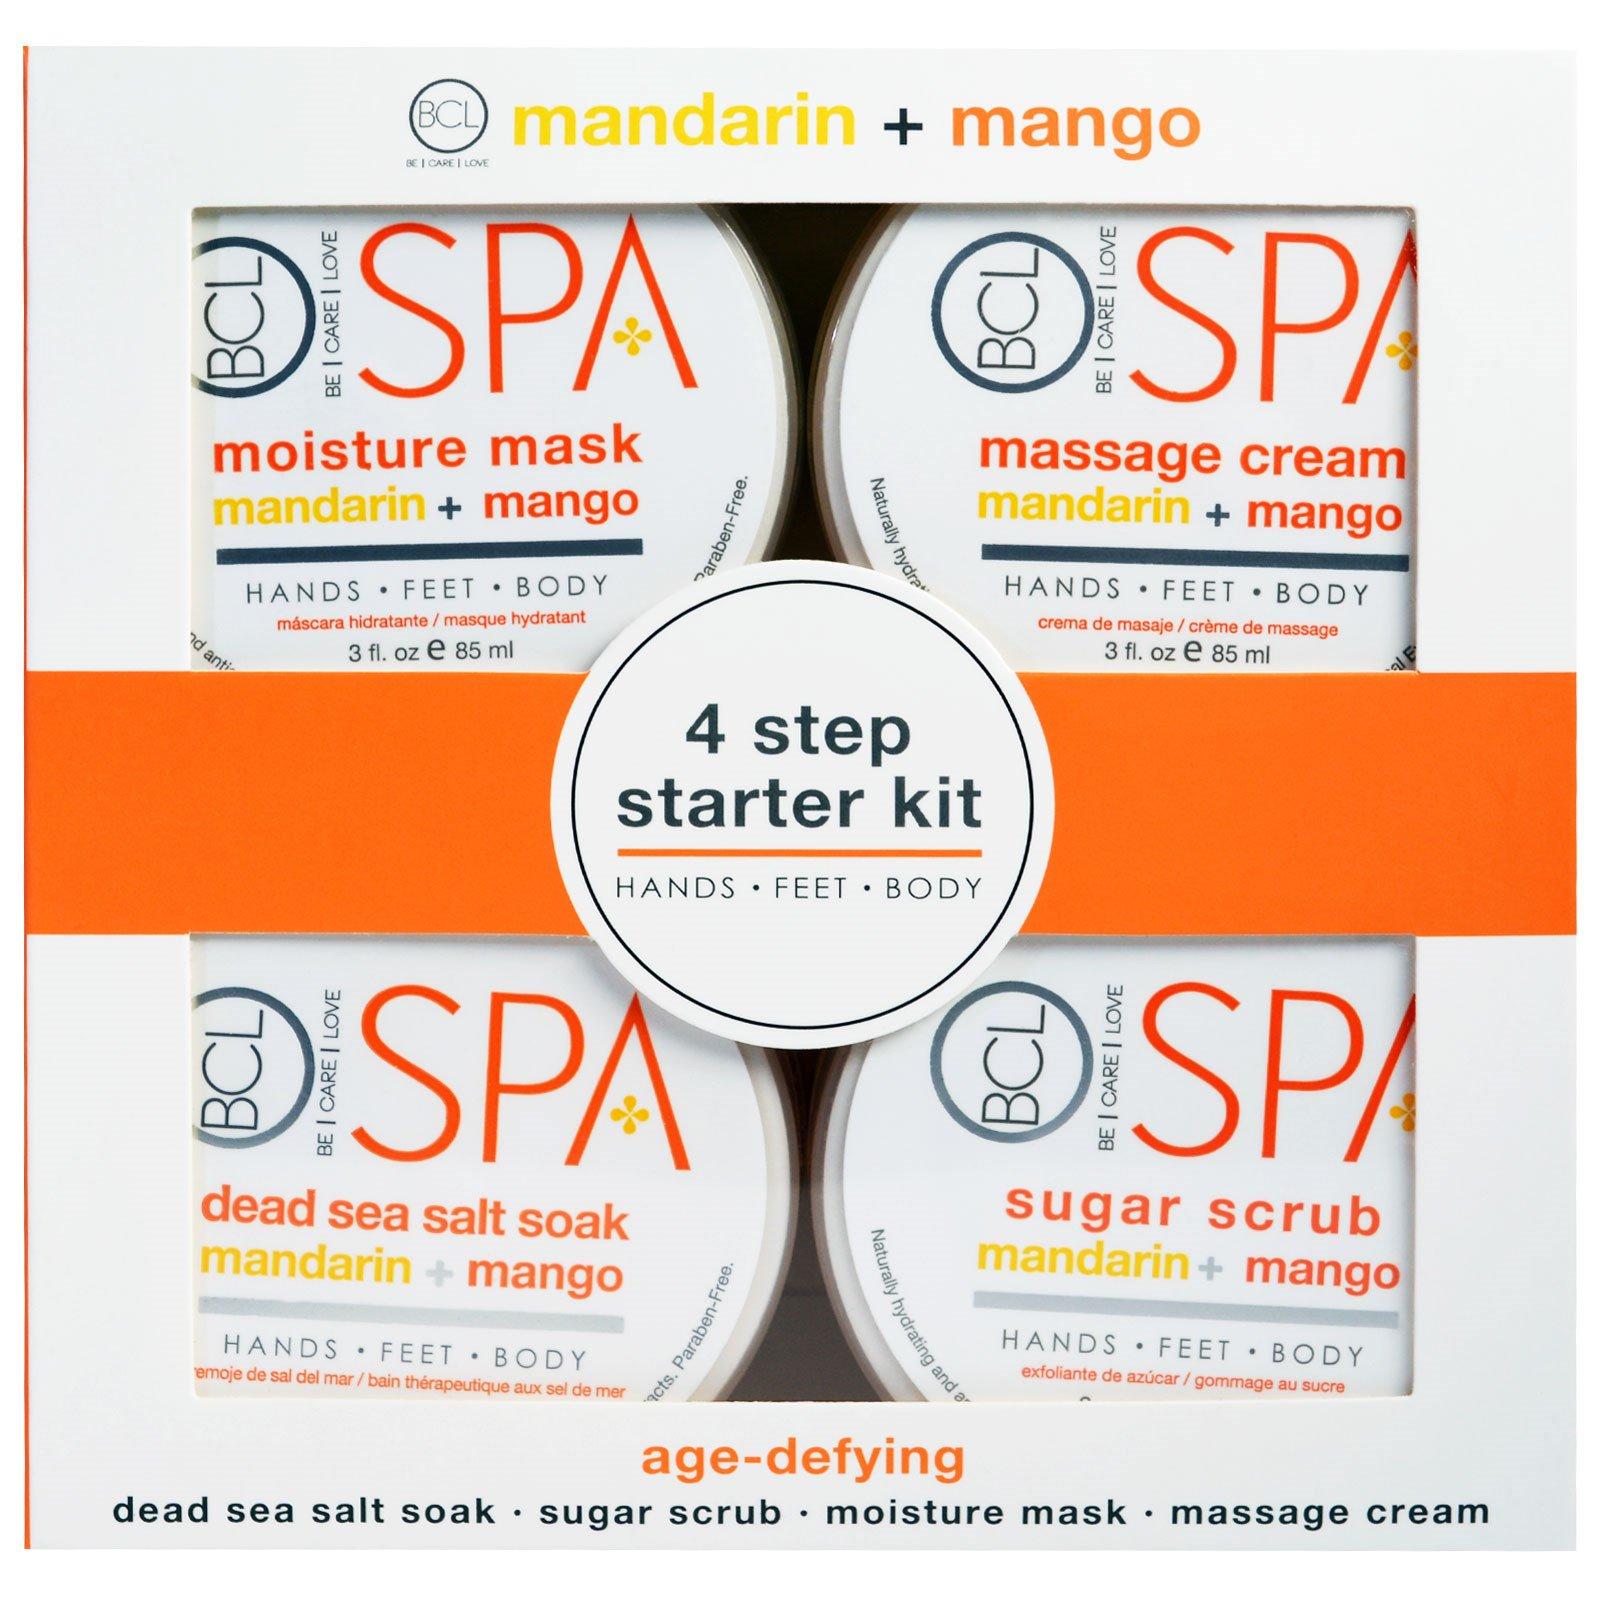 Petal Fresh, Spa, начальный набор из 4 шагов, антивозрастной, мандарин + манго, по 85 мл